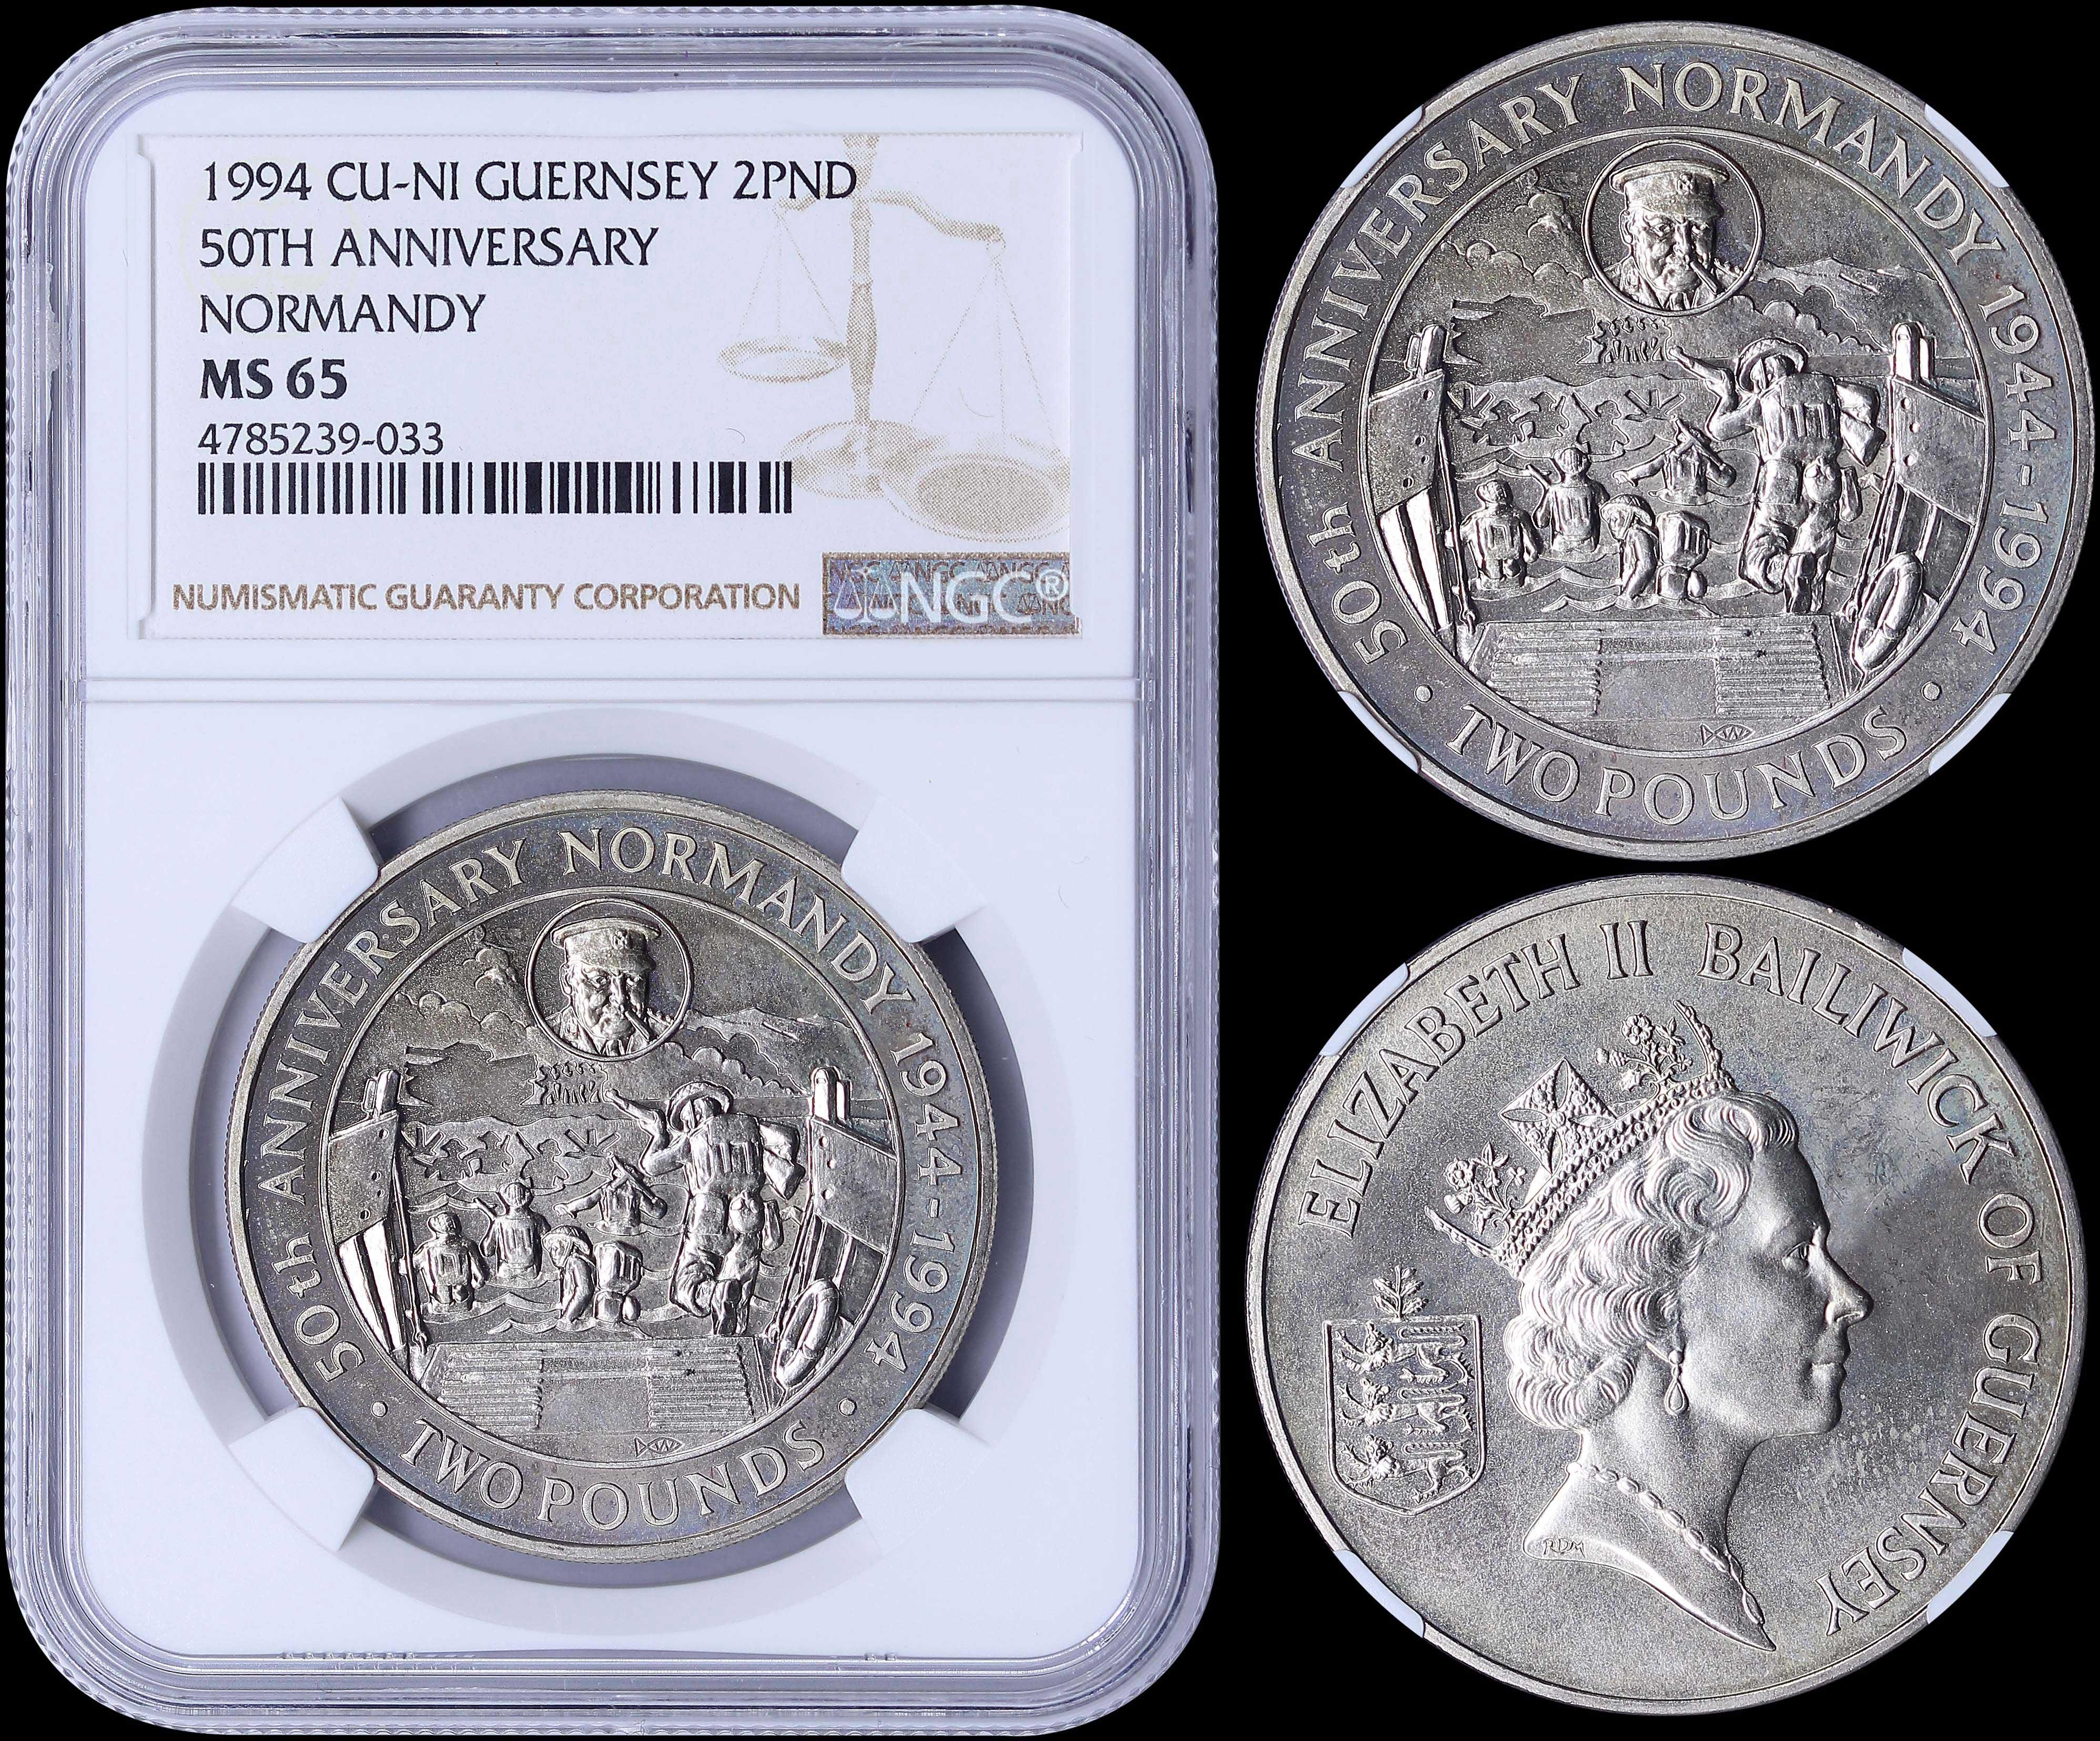 Lot 6947 - -  COINS & TOKENS COINS & TOKENS OF EUROPEAN COUNTRIES -  A. Karamitsos Postal & Live Internet Auction 984 (Part B)